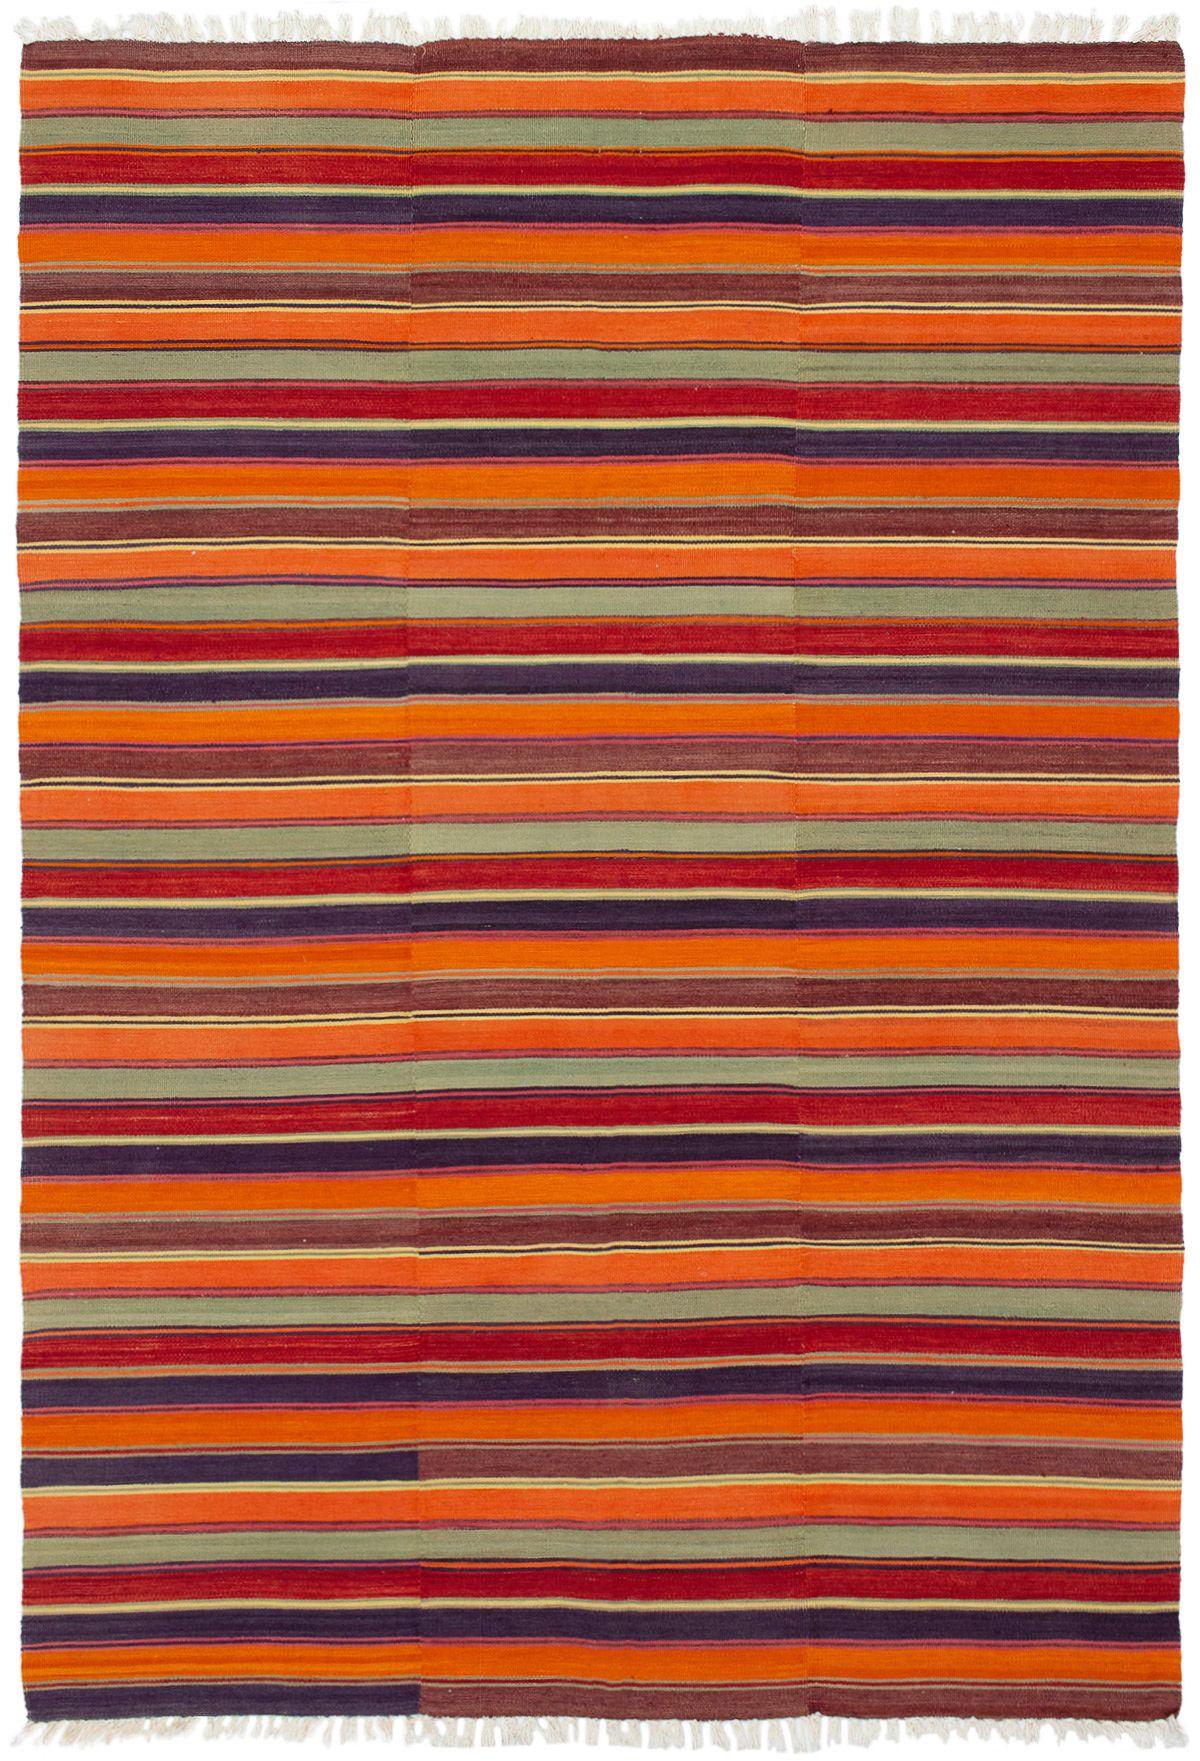 "Hand woven Bohemian Dark Red, Orange Wool Kilim 6'7"" x 9'6"" Size: 6'7"" x 9'6"""